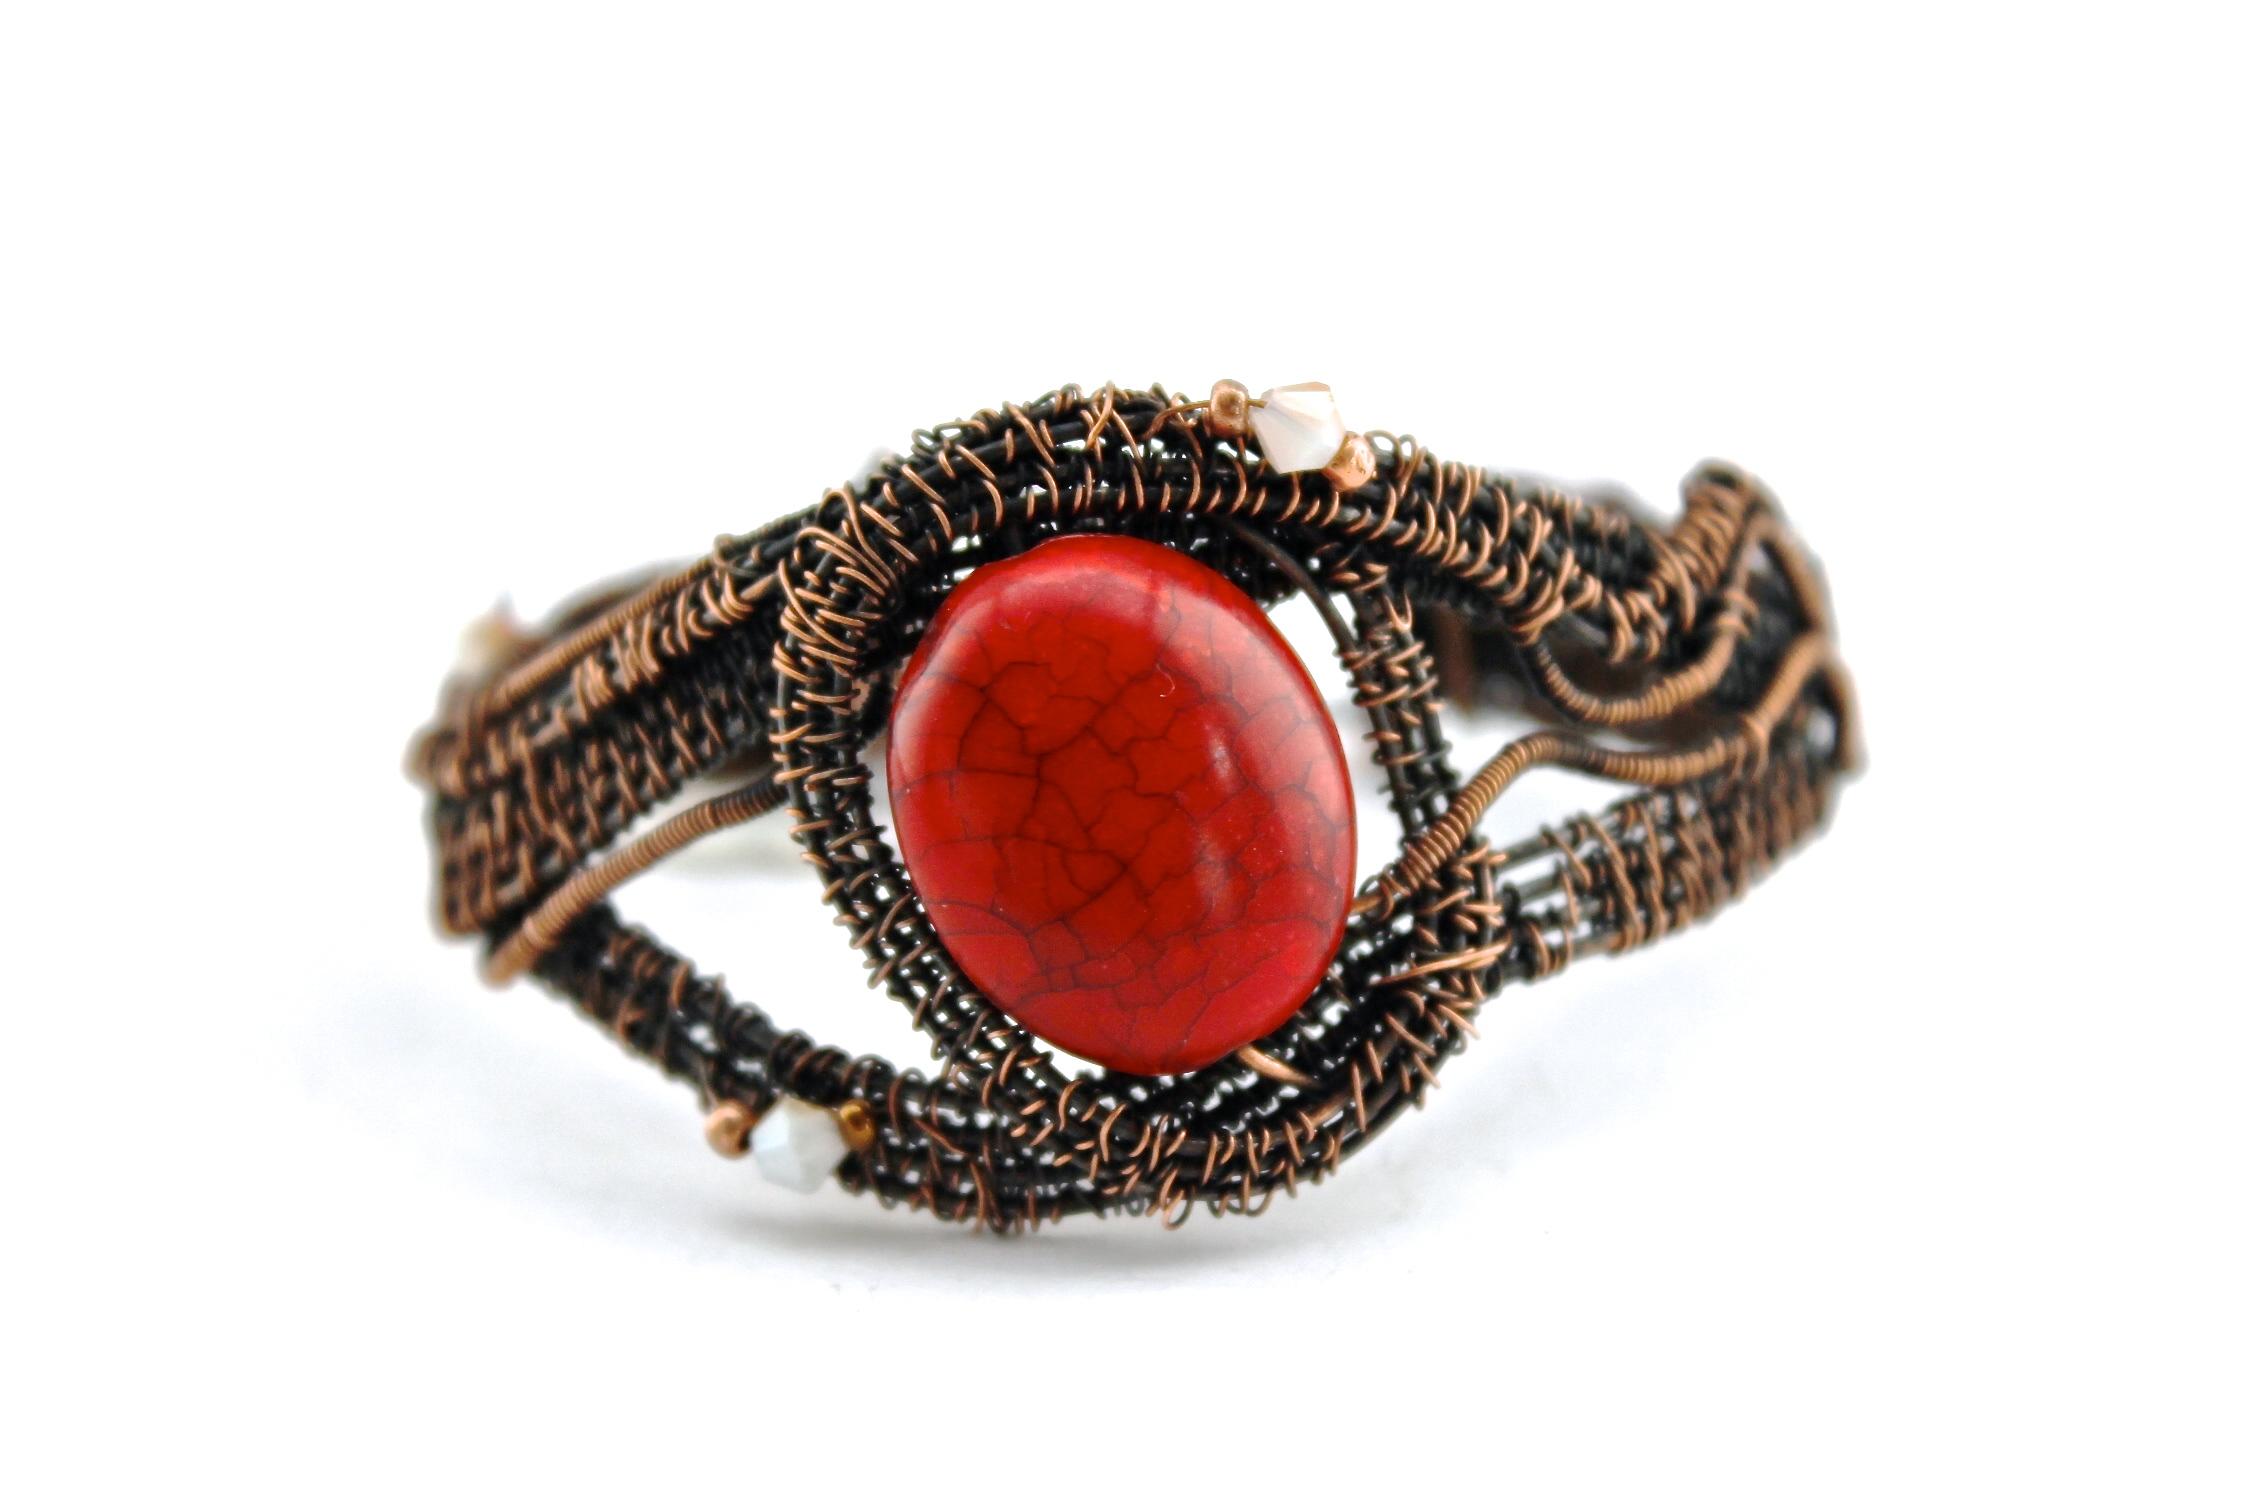 Red Stone + Wire Warp Bracelet